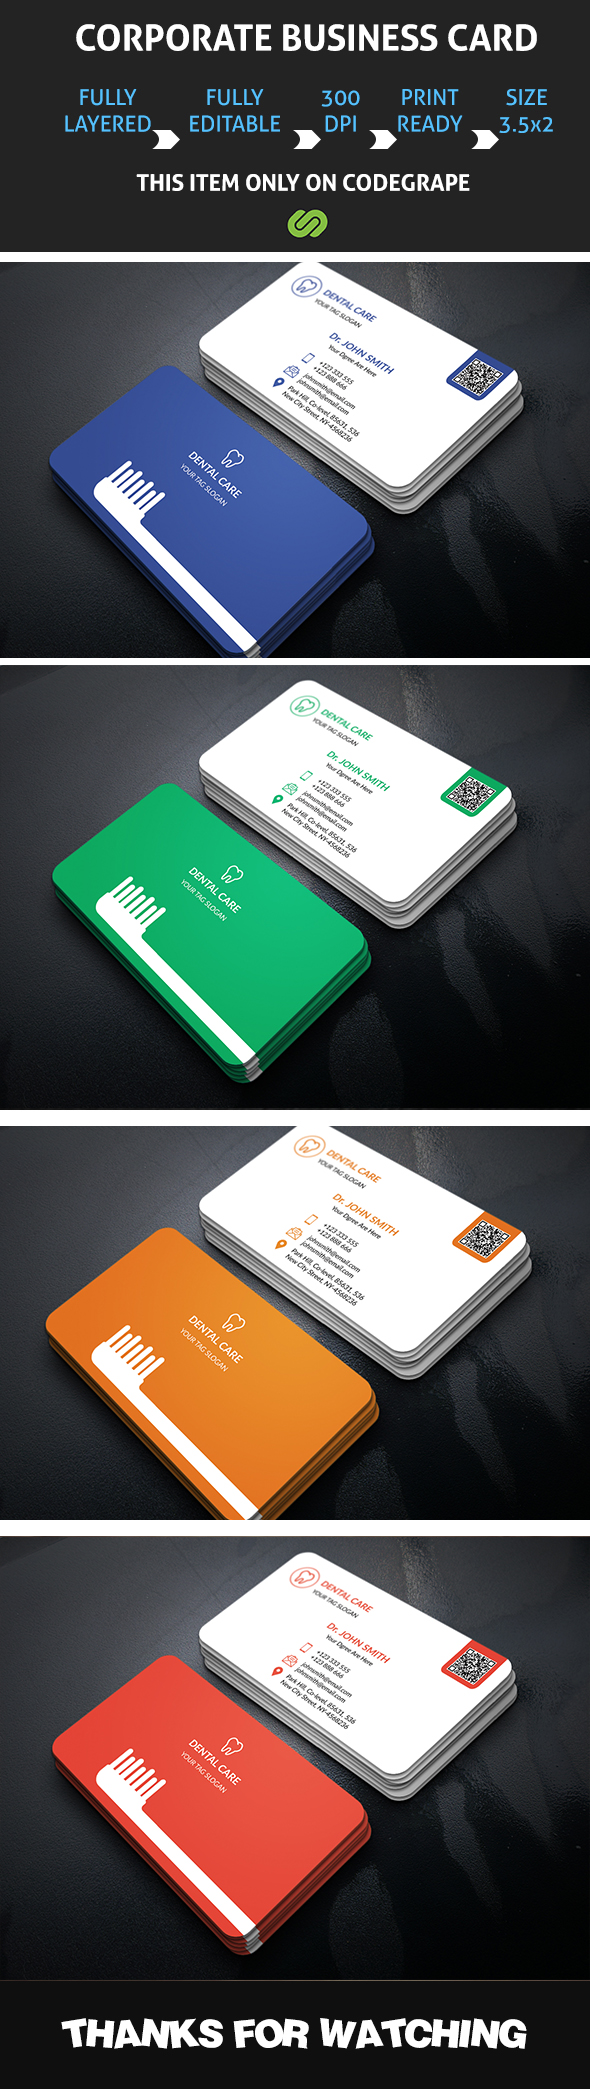 Dental business card dental business cards dental and business cards dental business card reheart Choice Image